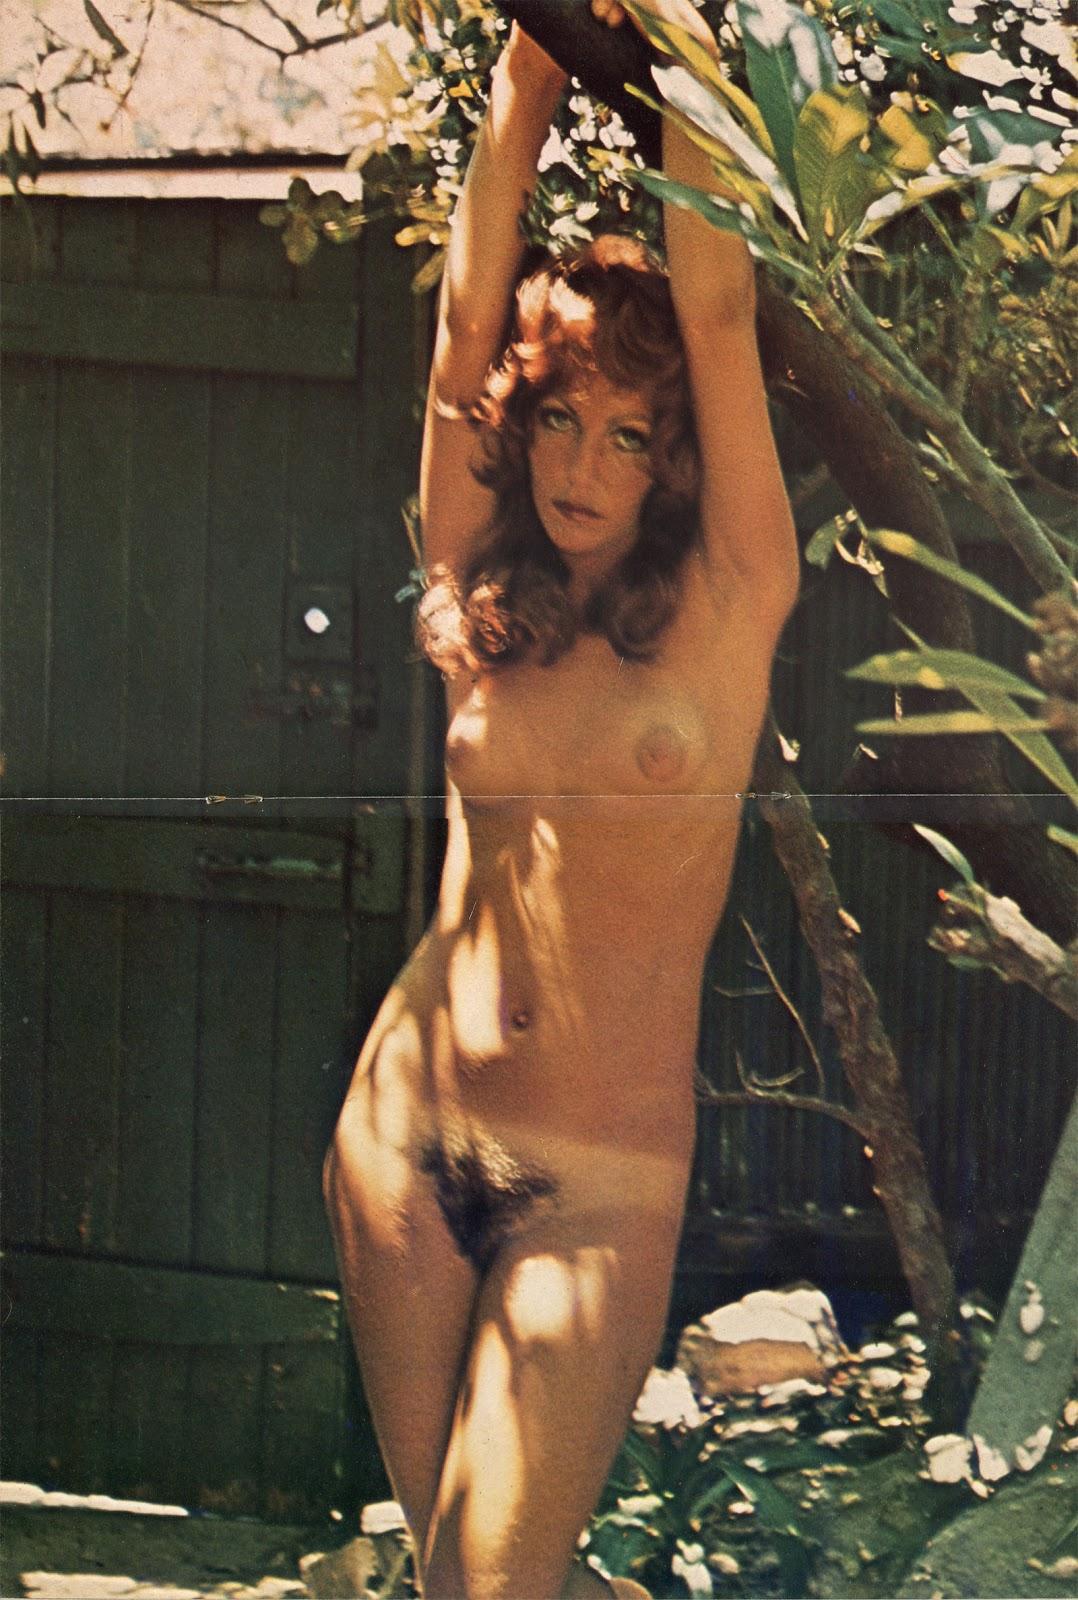 blaze star nude